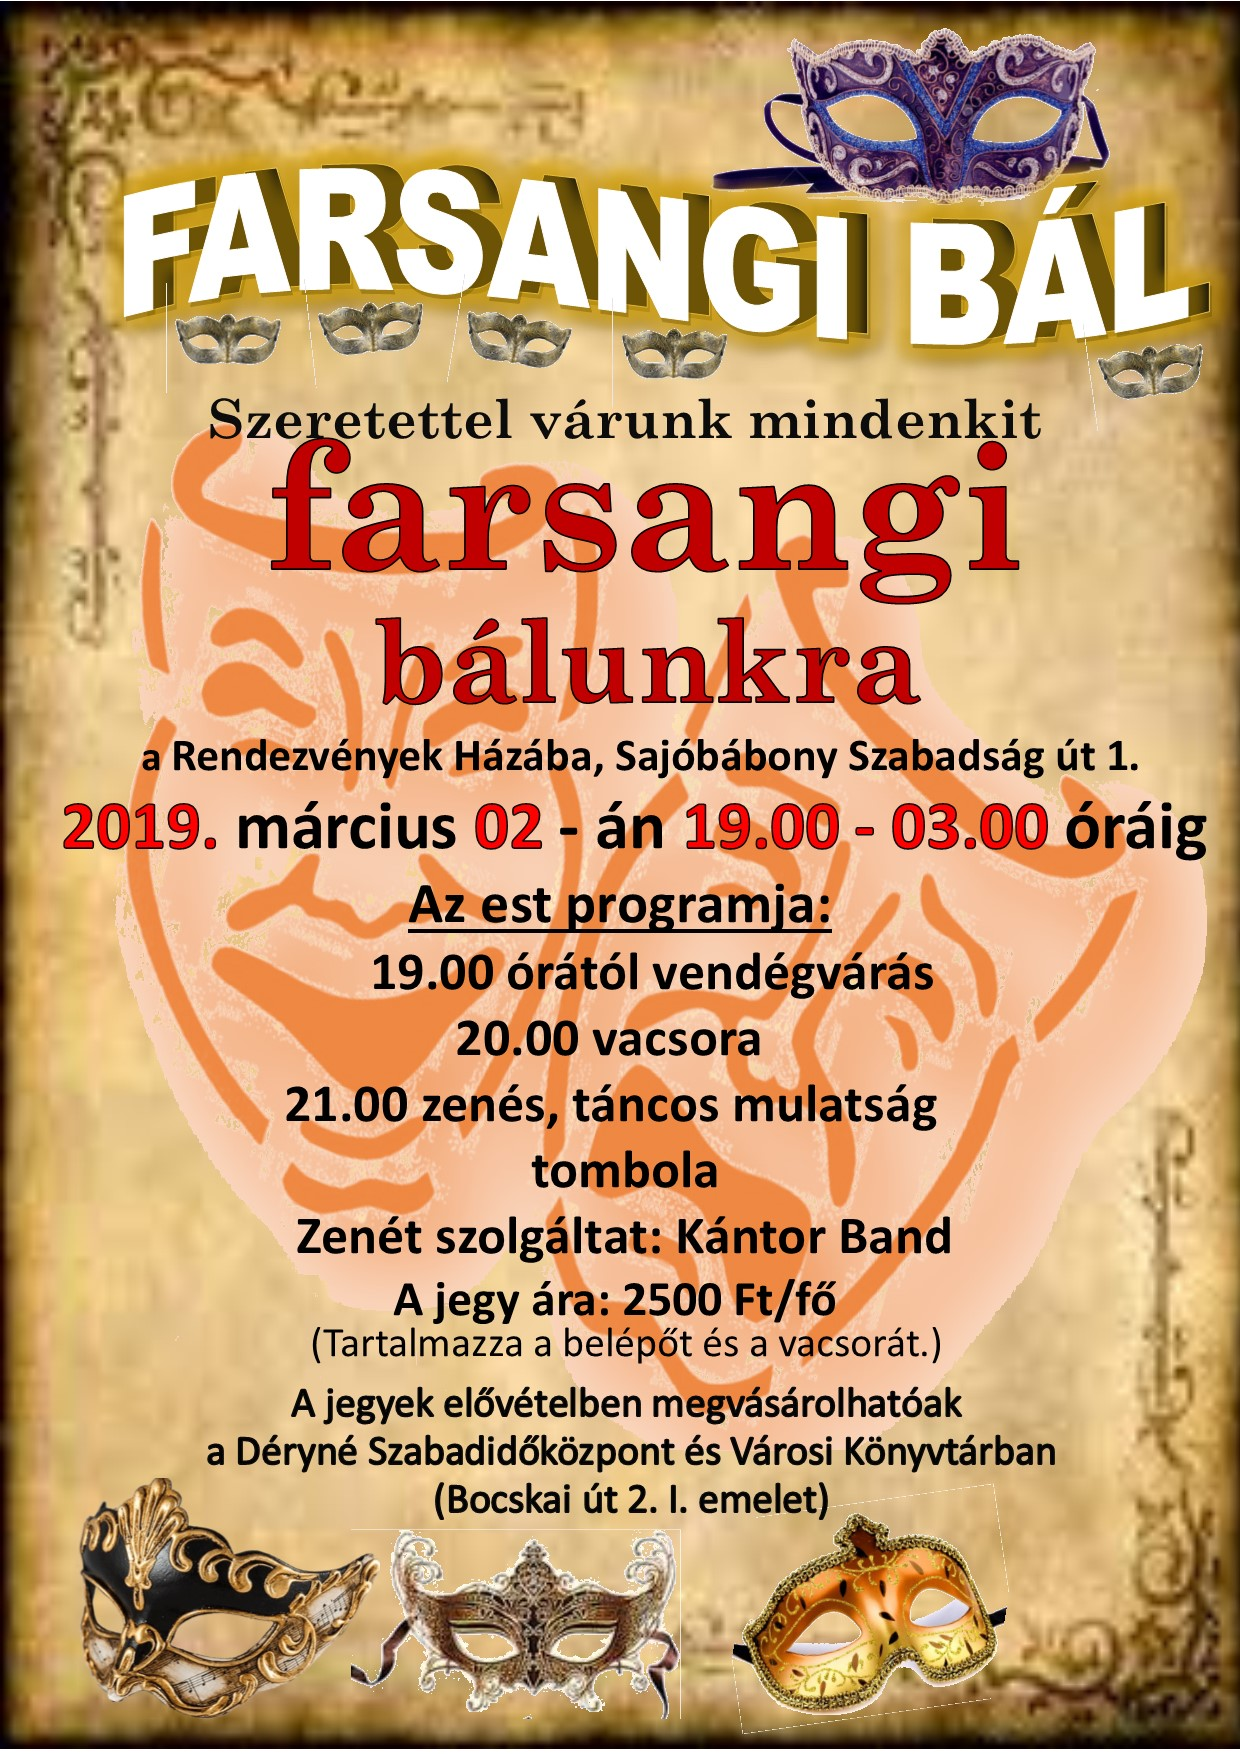 Farsangi bál 2019 (1)